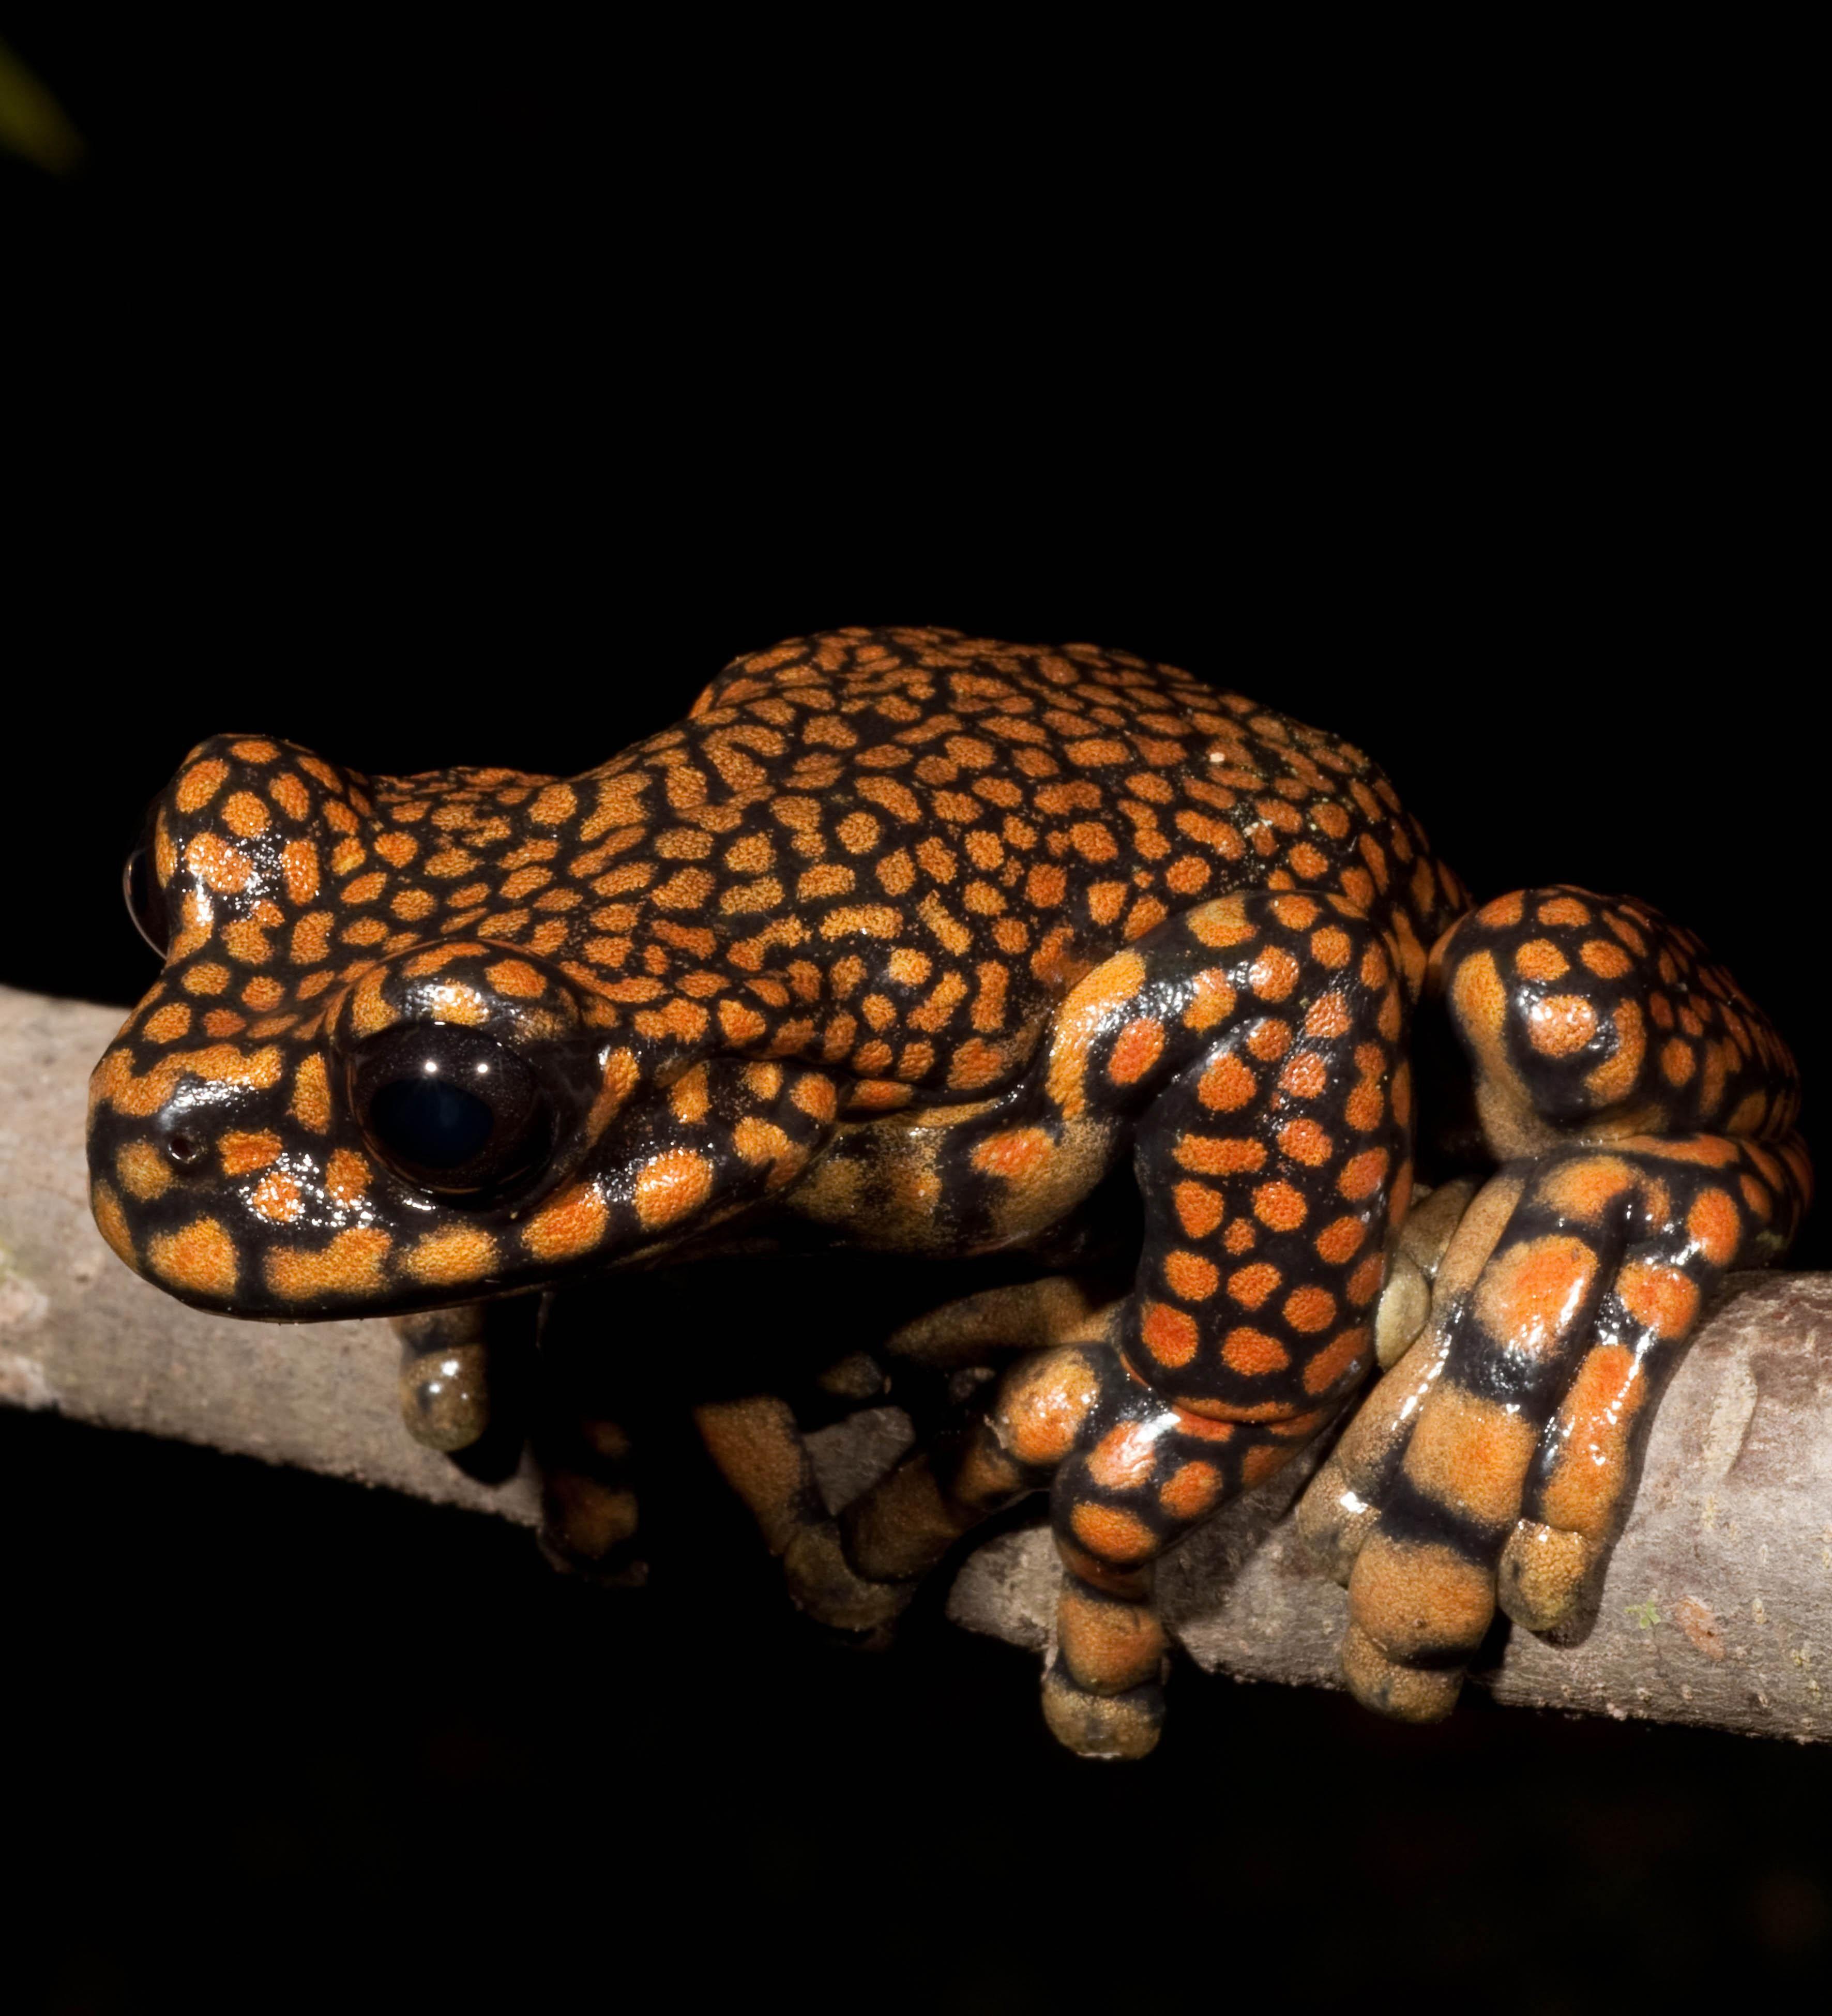 Prince Charles Stream Tree Frog (Hyloscirtus princecharlesi) | Frogs ...